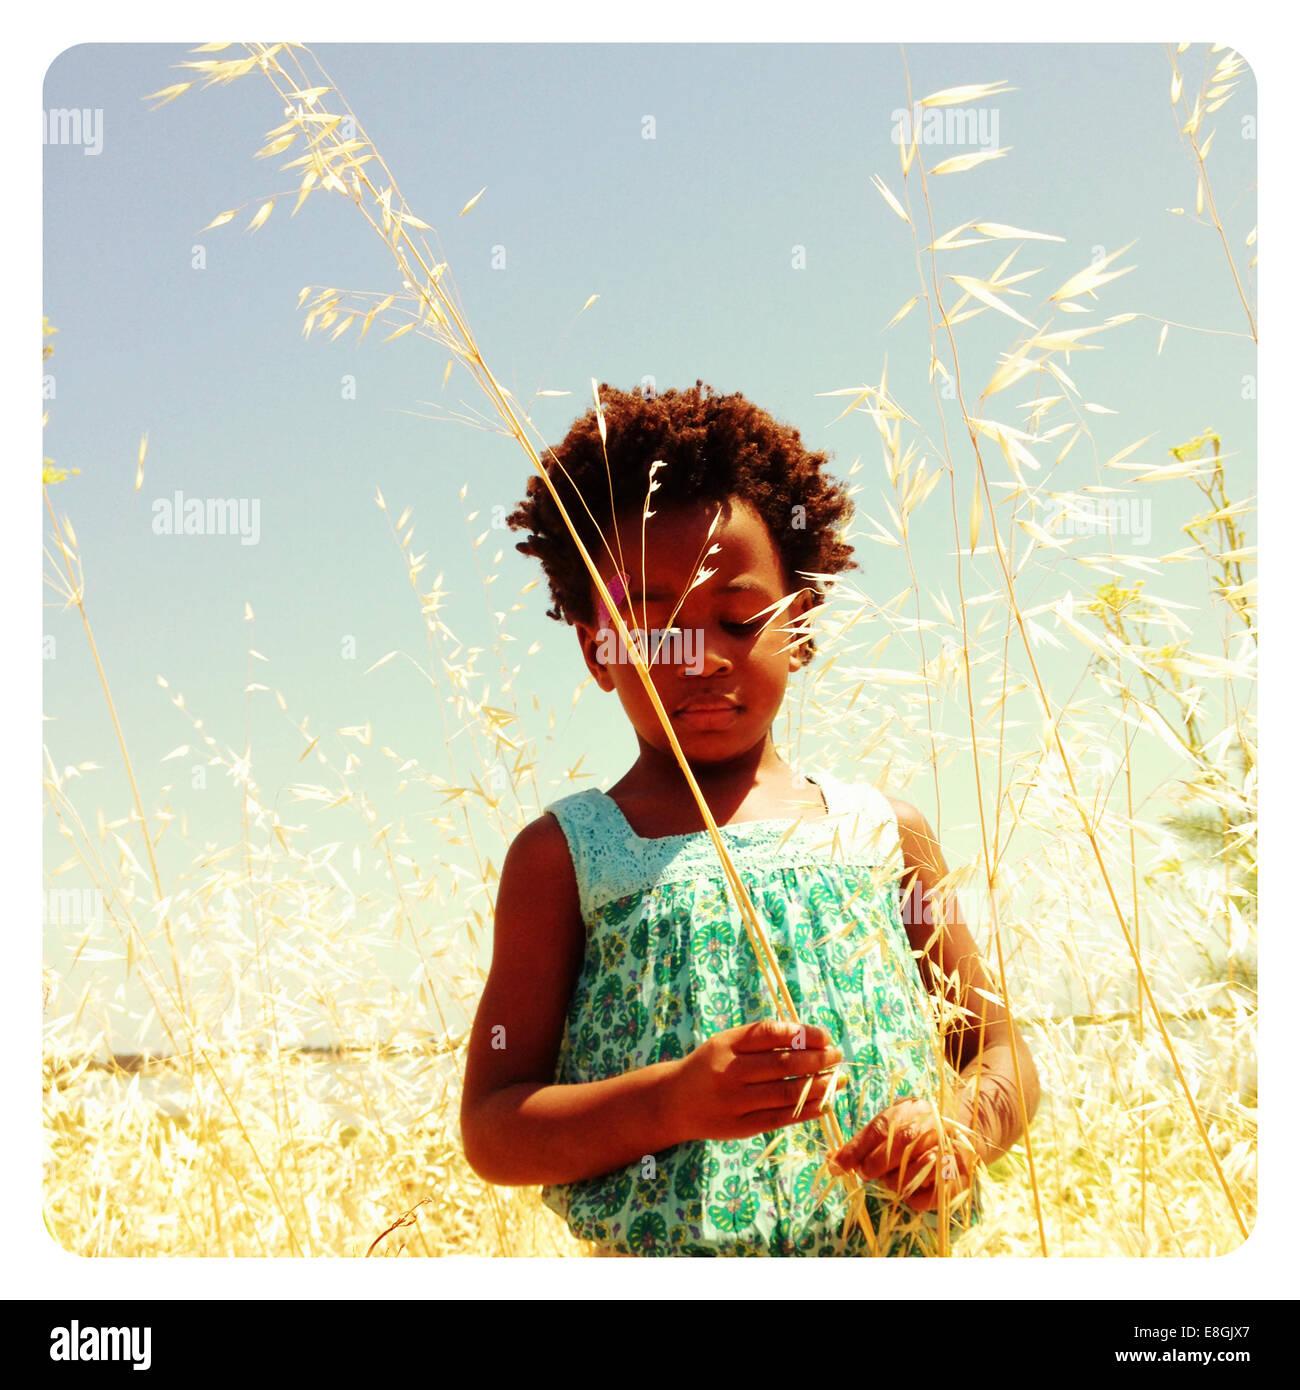 USA, California, San Mateo County, Burlingame, Girl standing in grass - Stock Image